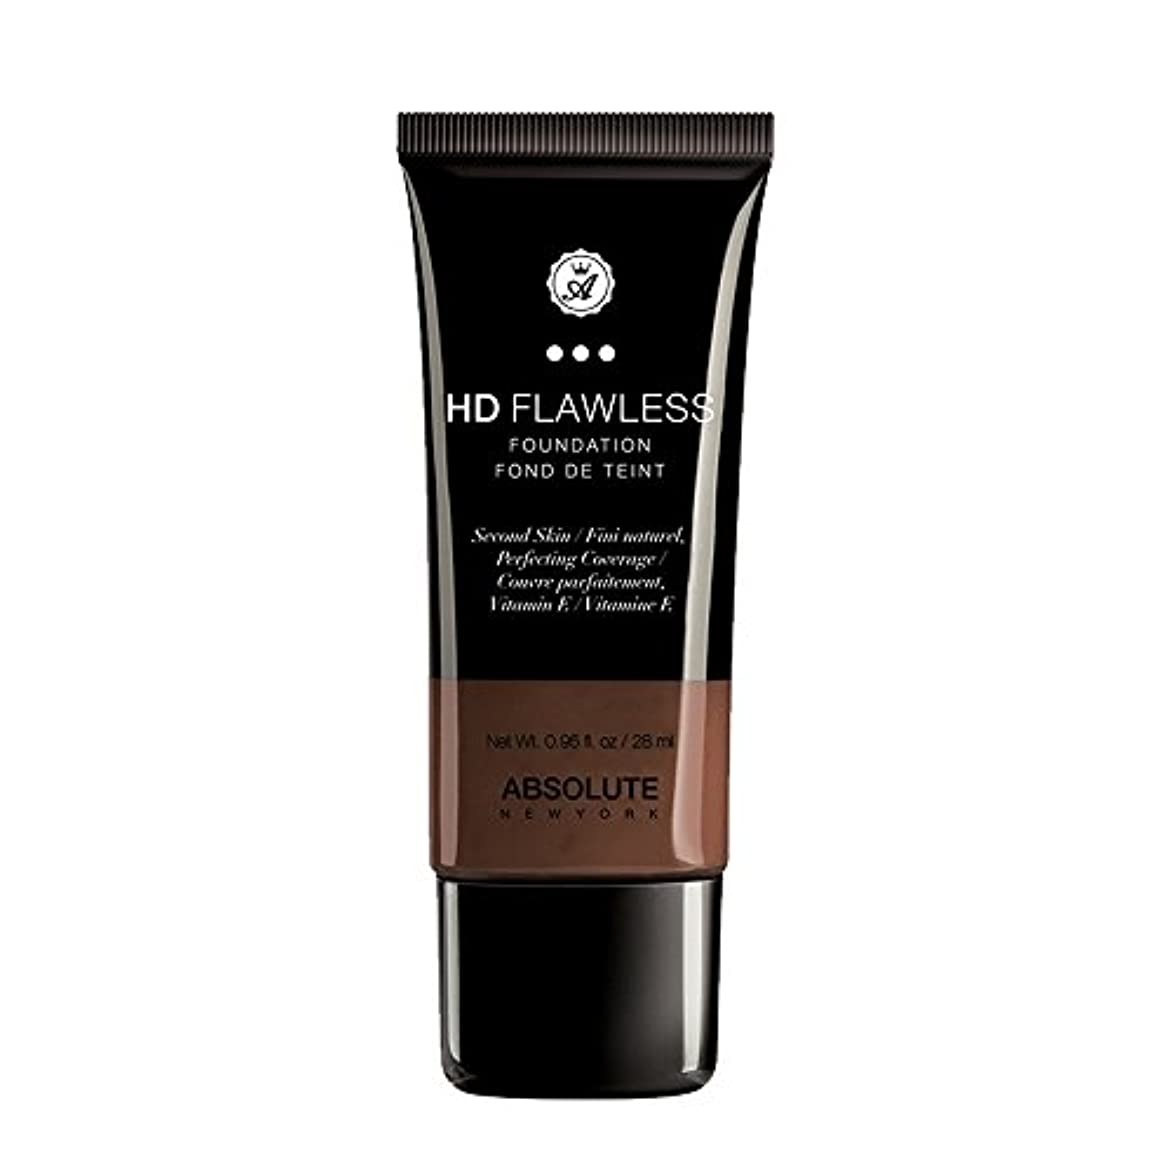 (3 Pack) ABSOLUTE HD Flawless Fluid Foundation - Espresso (並行輸入品)